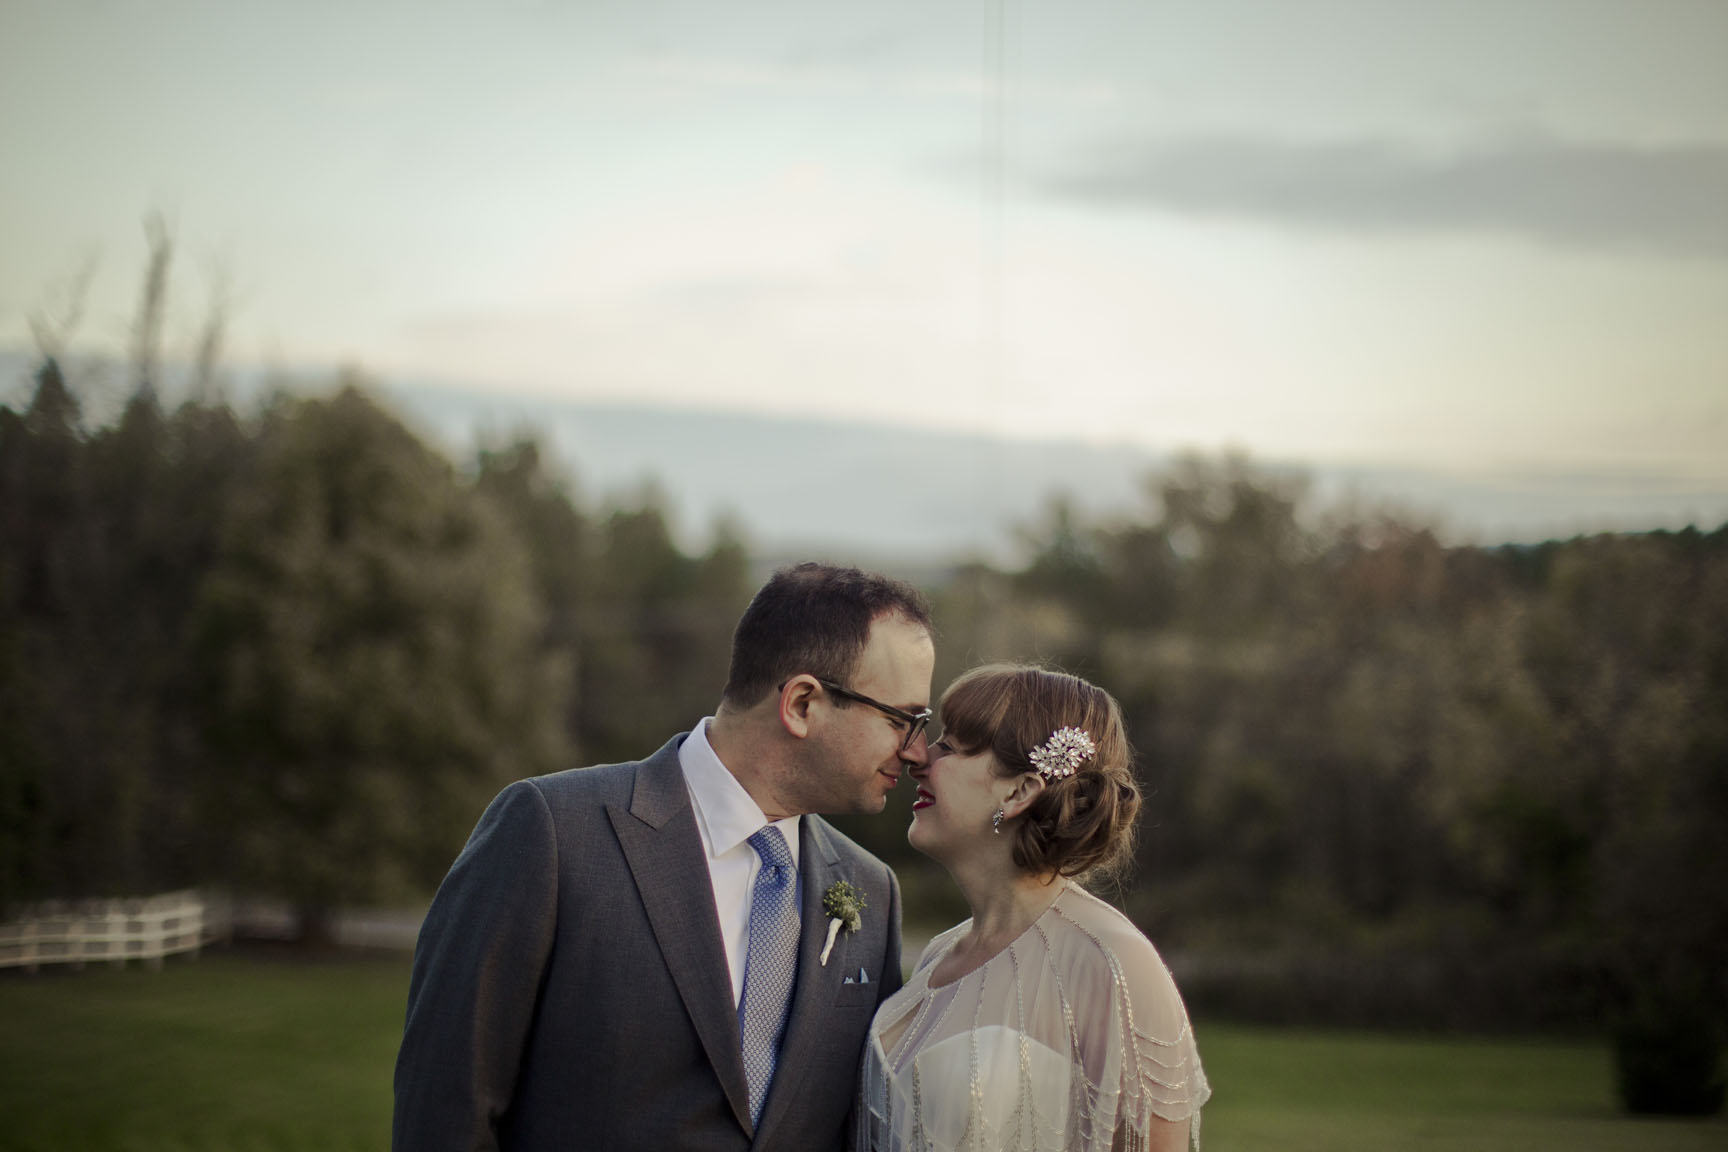 SGP_Alison&Dave_TheStory114